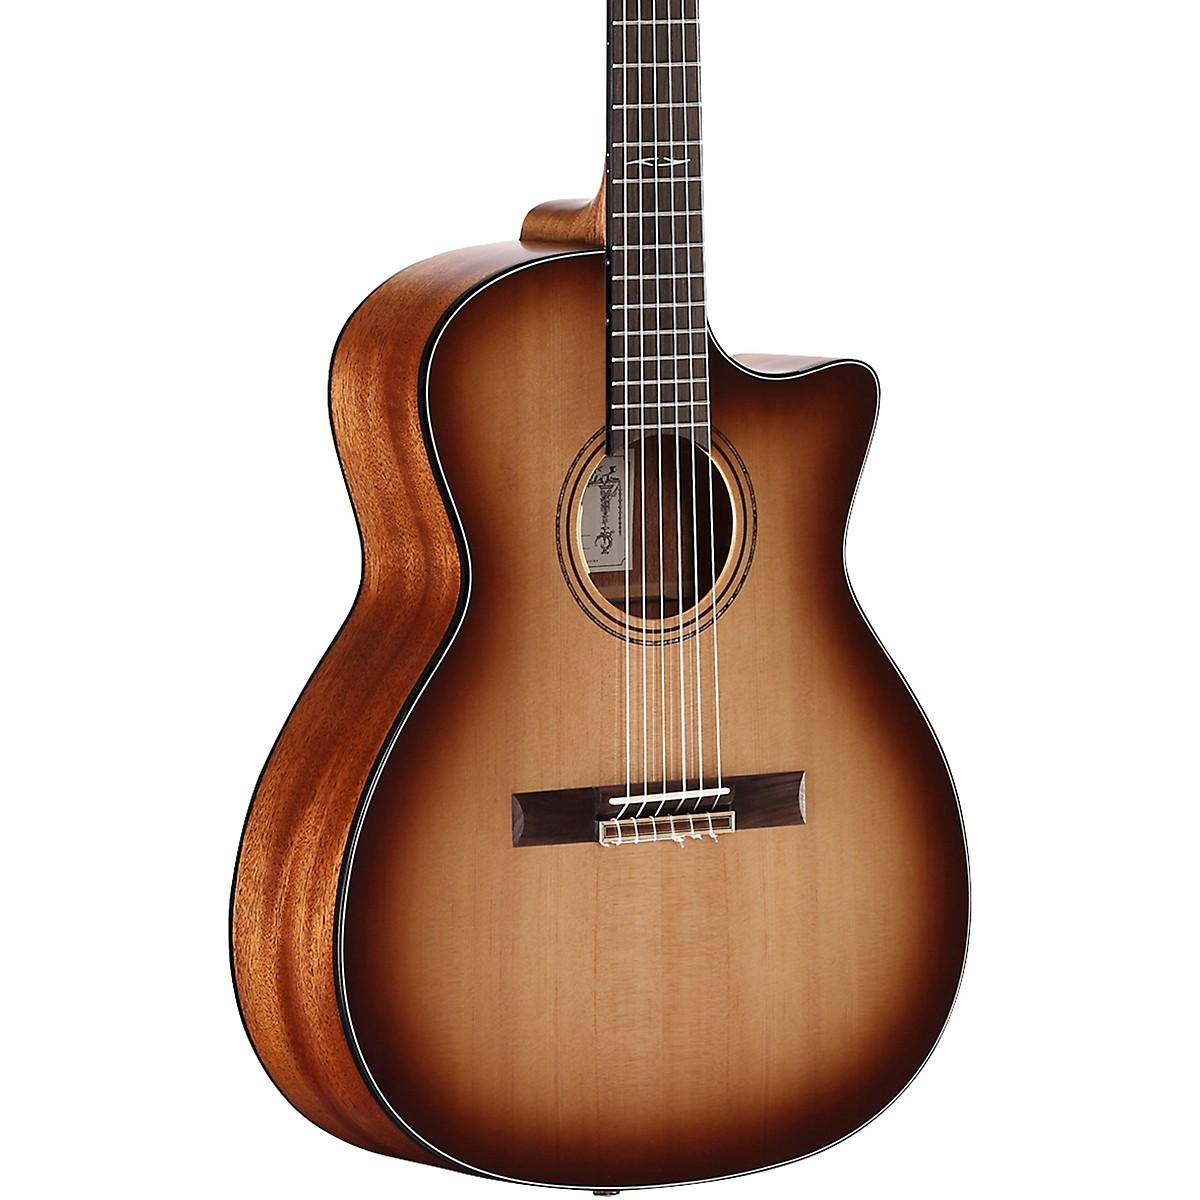 Alvarez AG610CESHB-N Artist Grand Auditorium Nylon String Acoustic-Electric Guitar